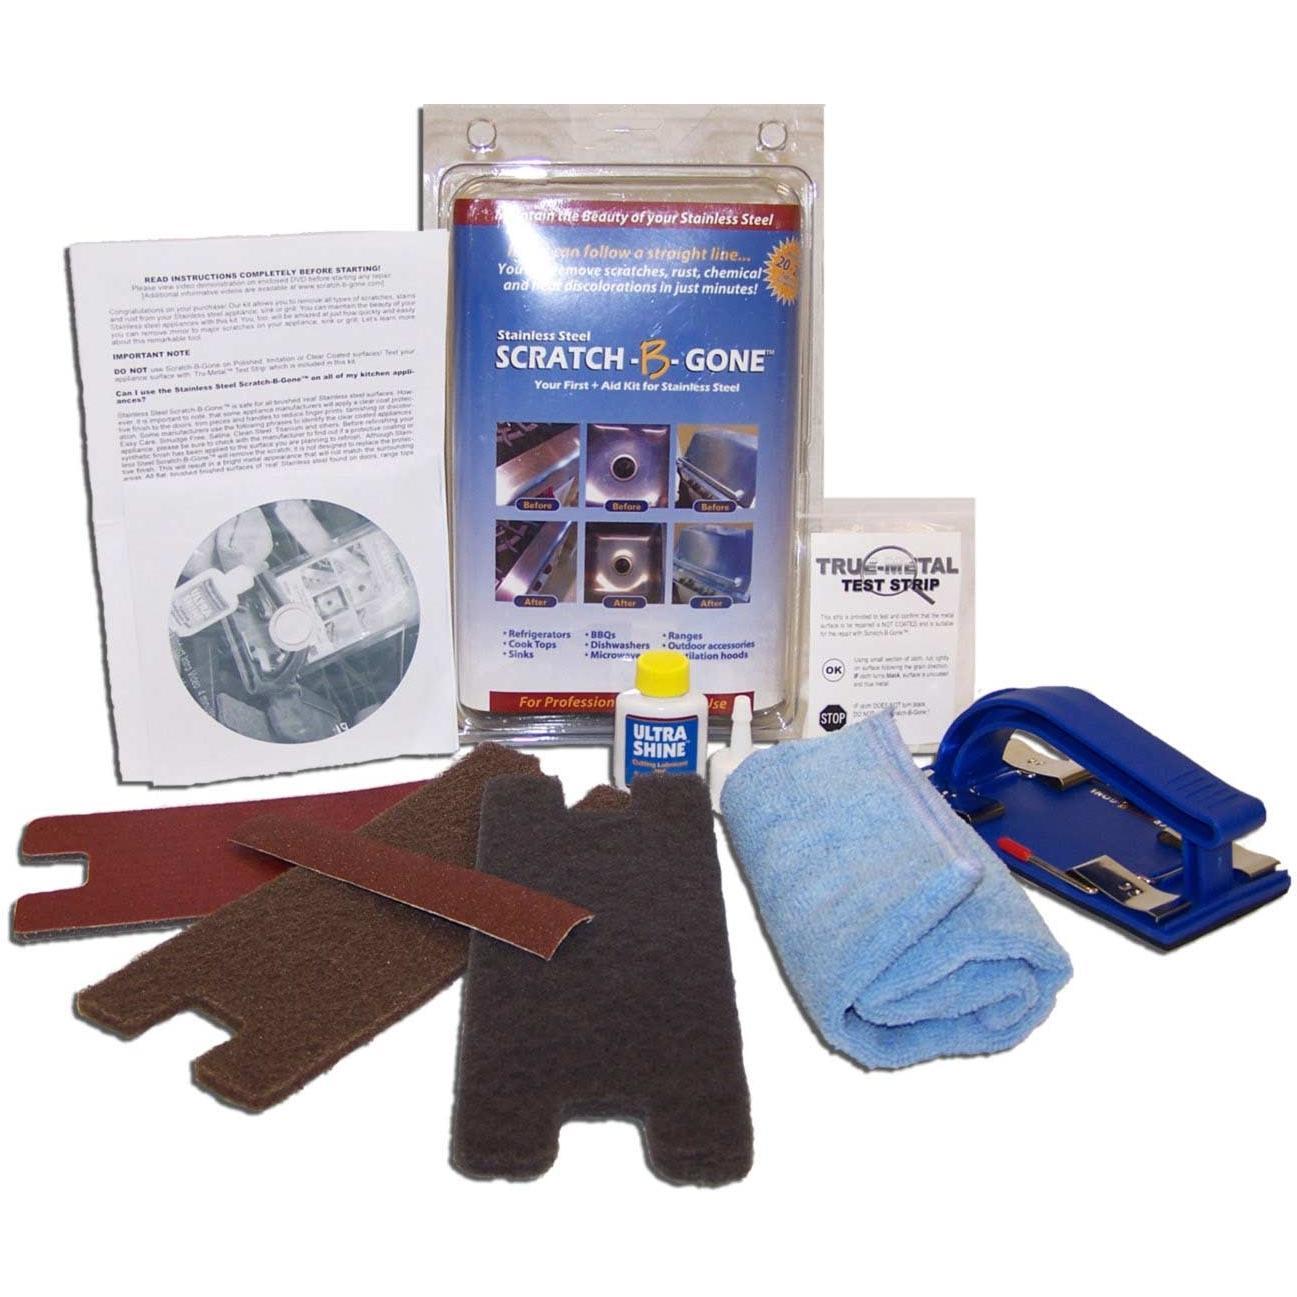 Scratch-B-Gone Home Scratch Remover Kit